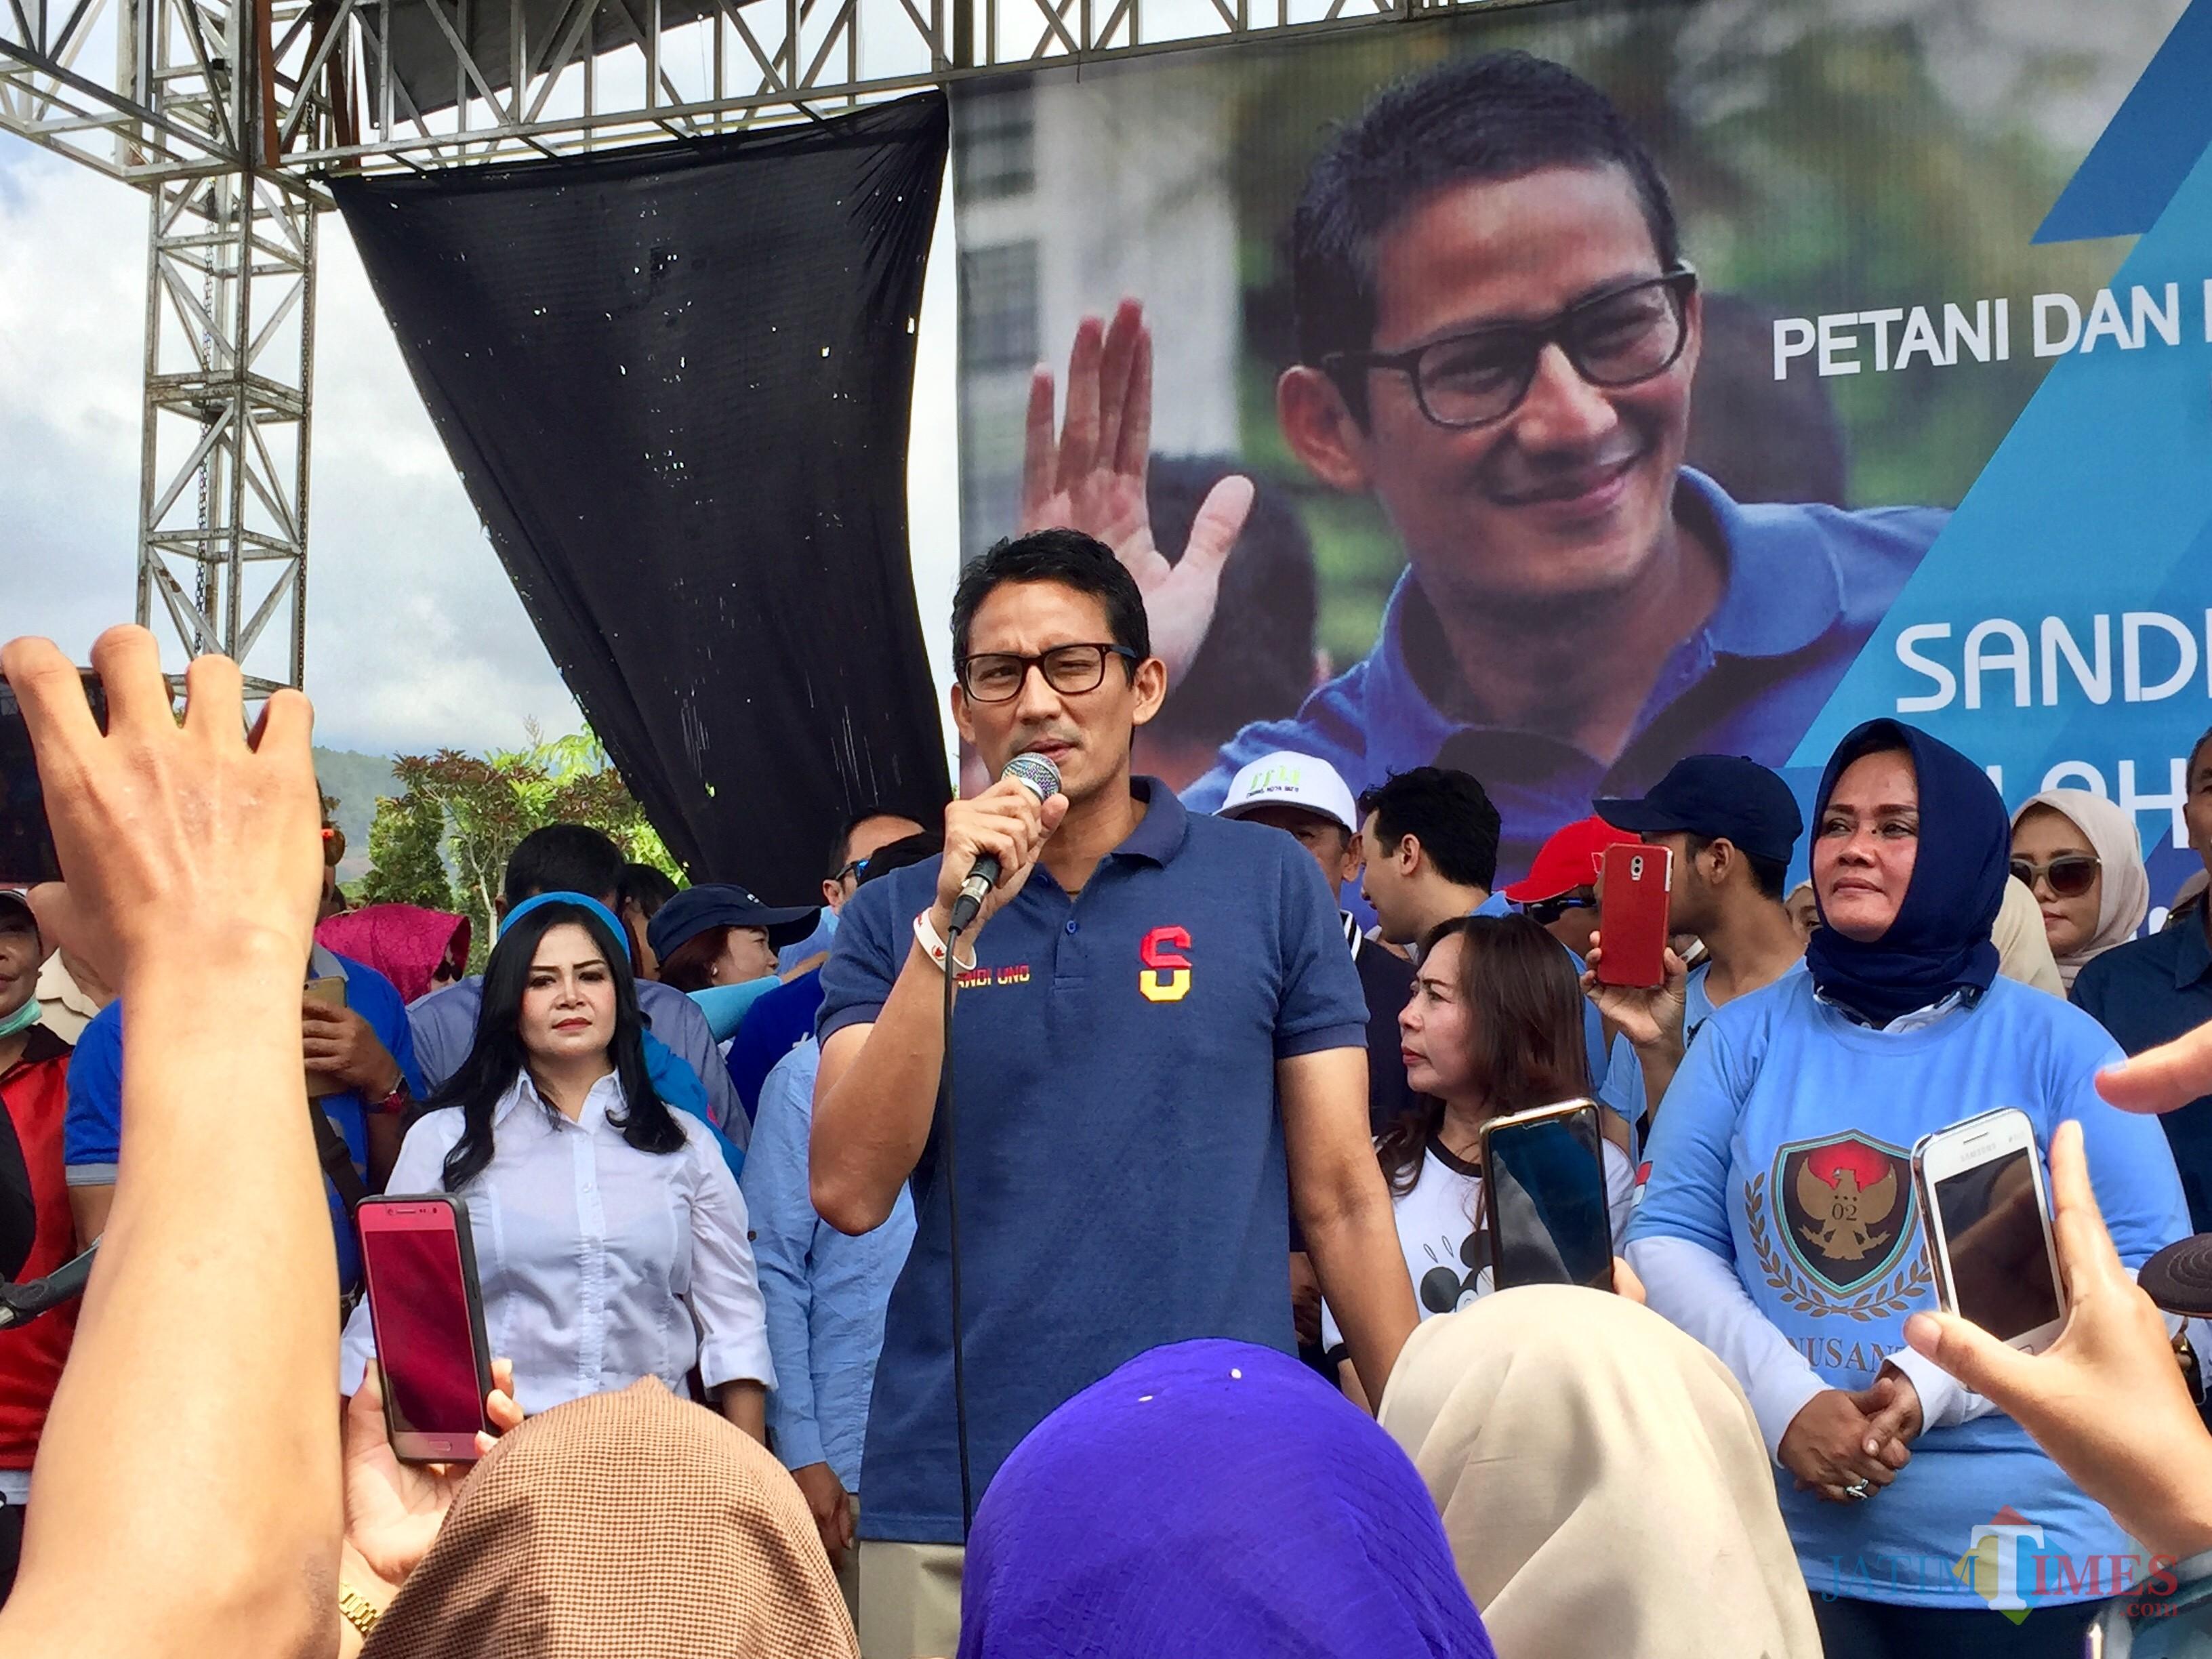 Sandiaga Salahuddin Uno saat berada di lapangan Pasar Bunga Desa Sidomulyo Kecamatan Batu, Sabtu (24/11/2018). (Foto: Irsya Richa/MalangTIMES)